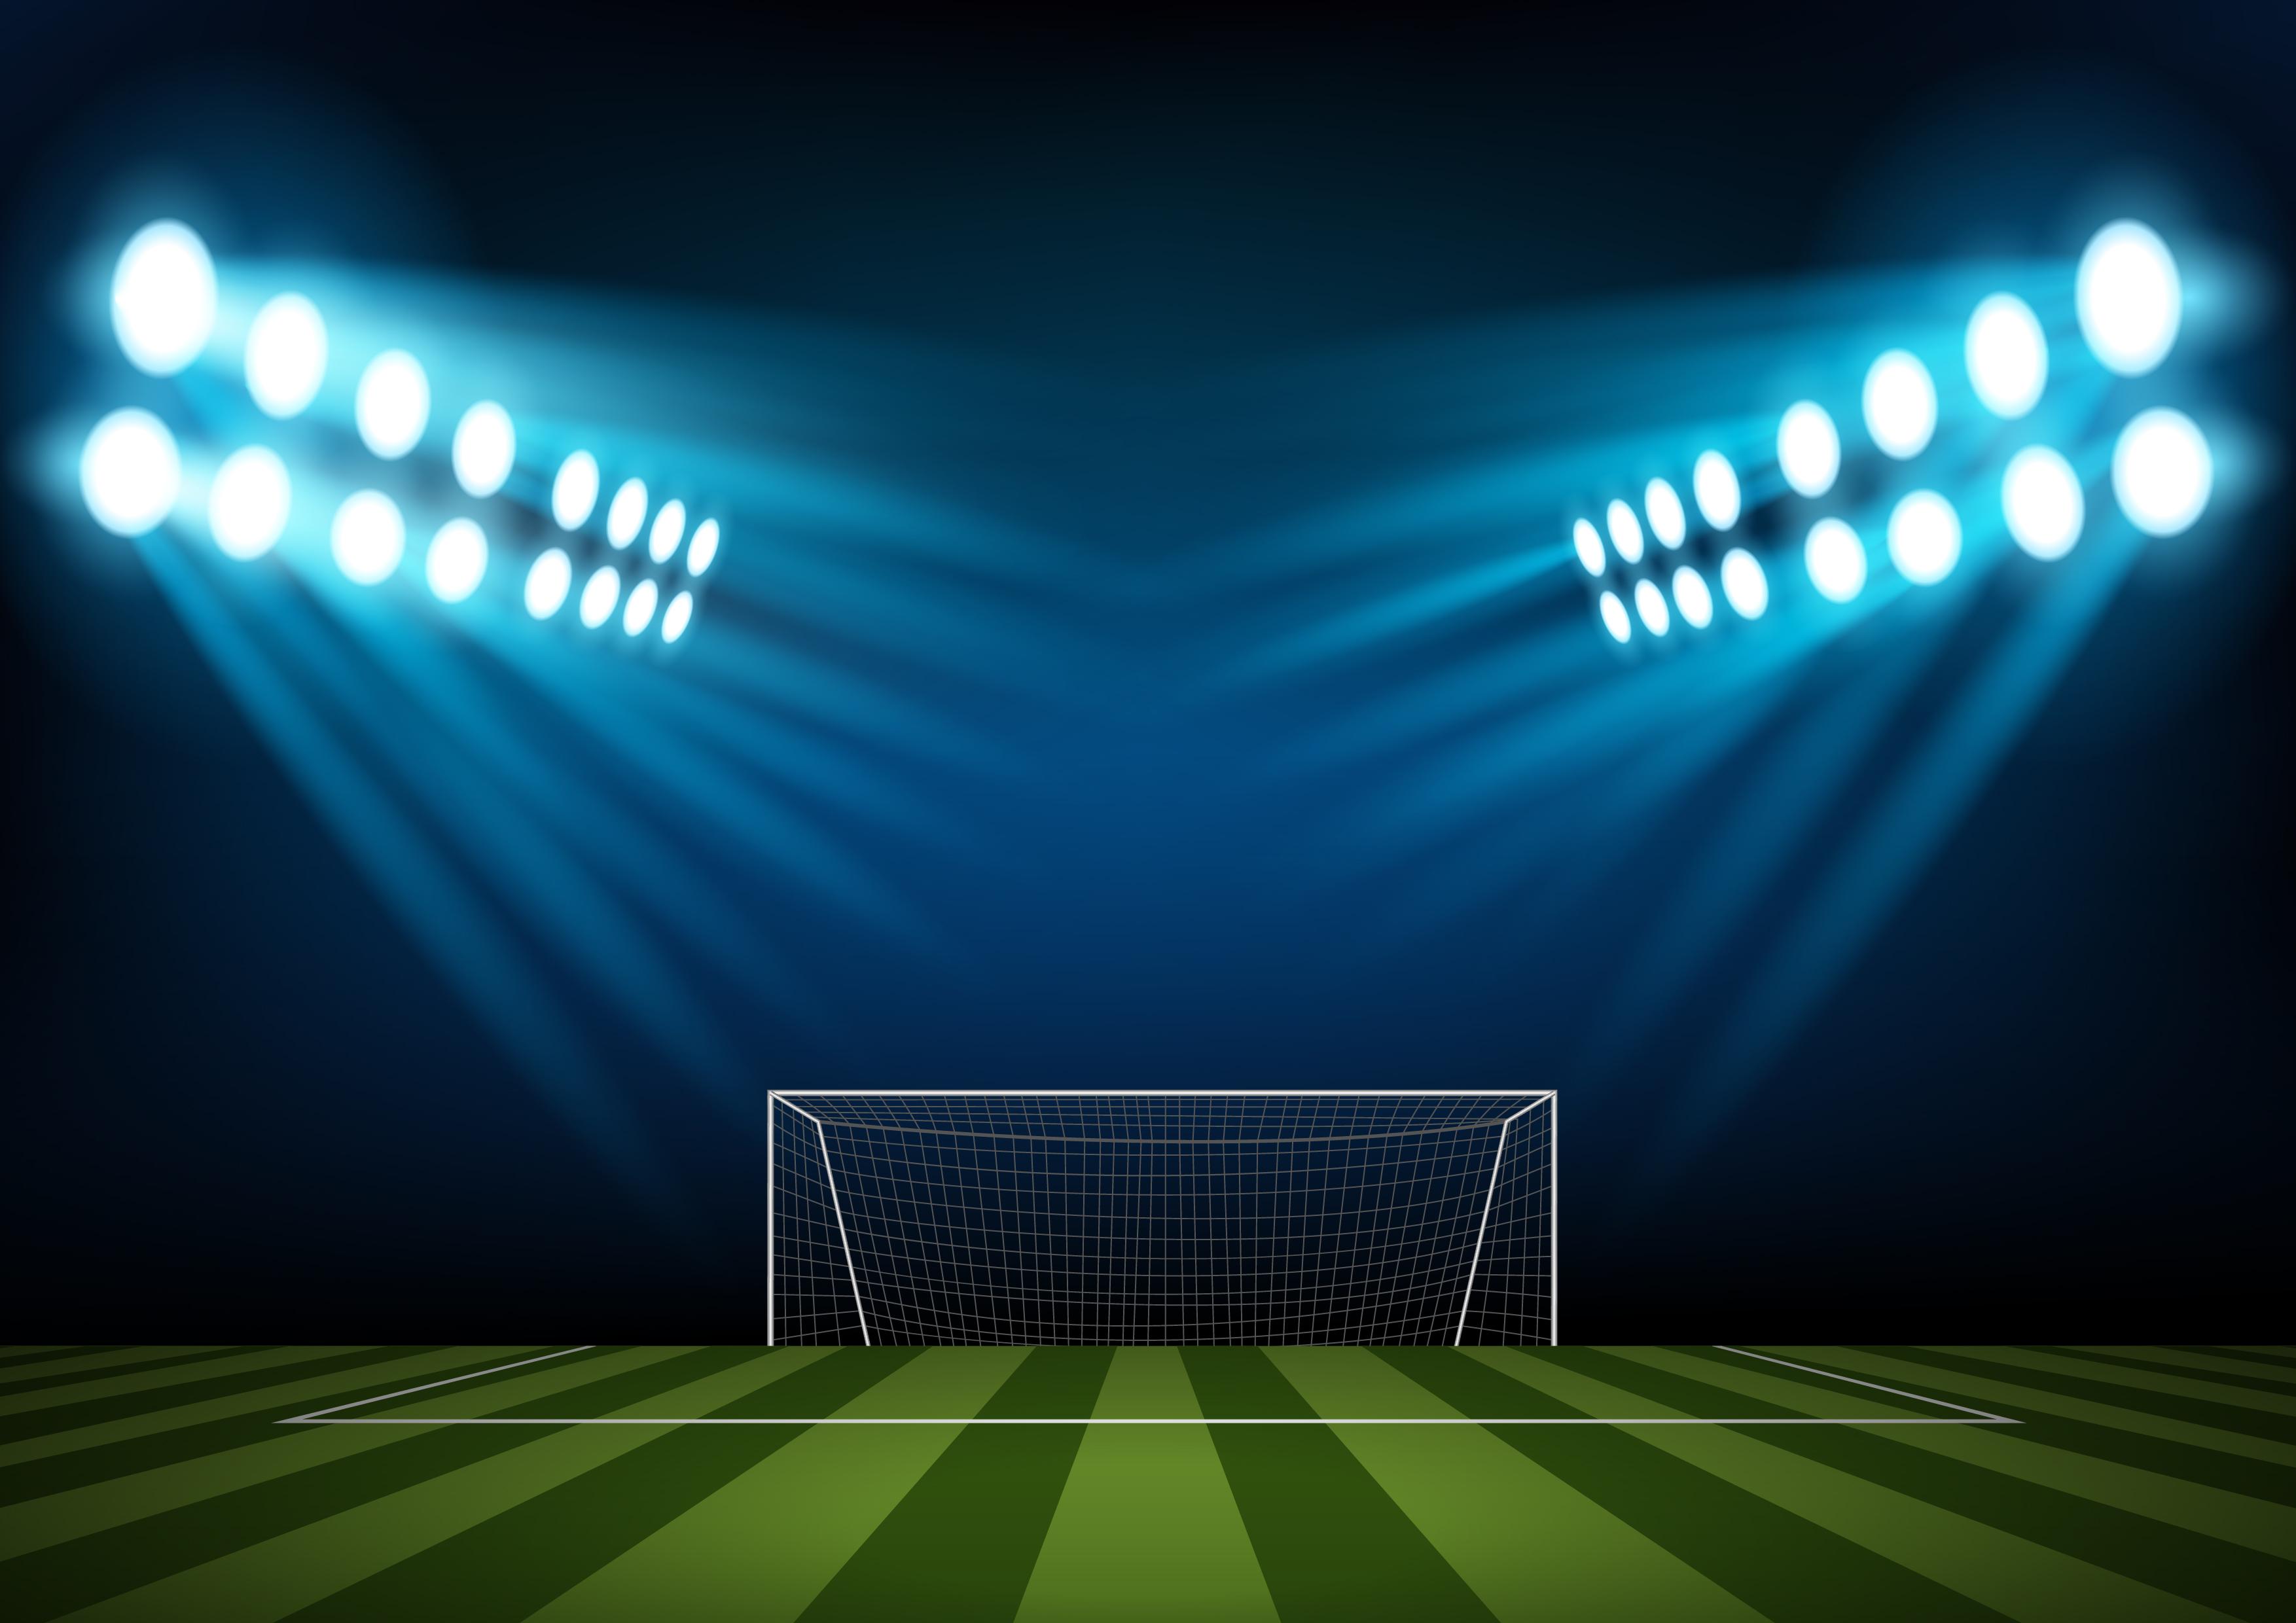 light soccer field sports background material  light